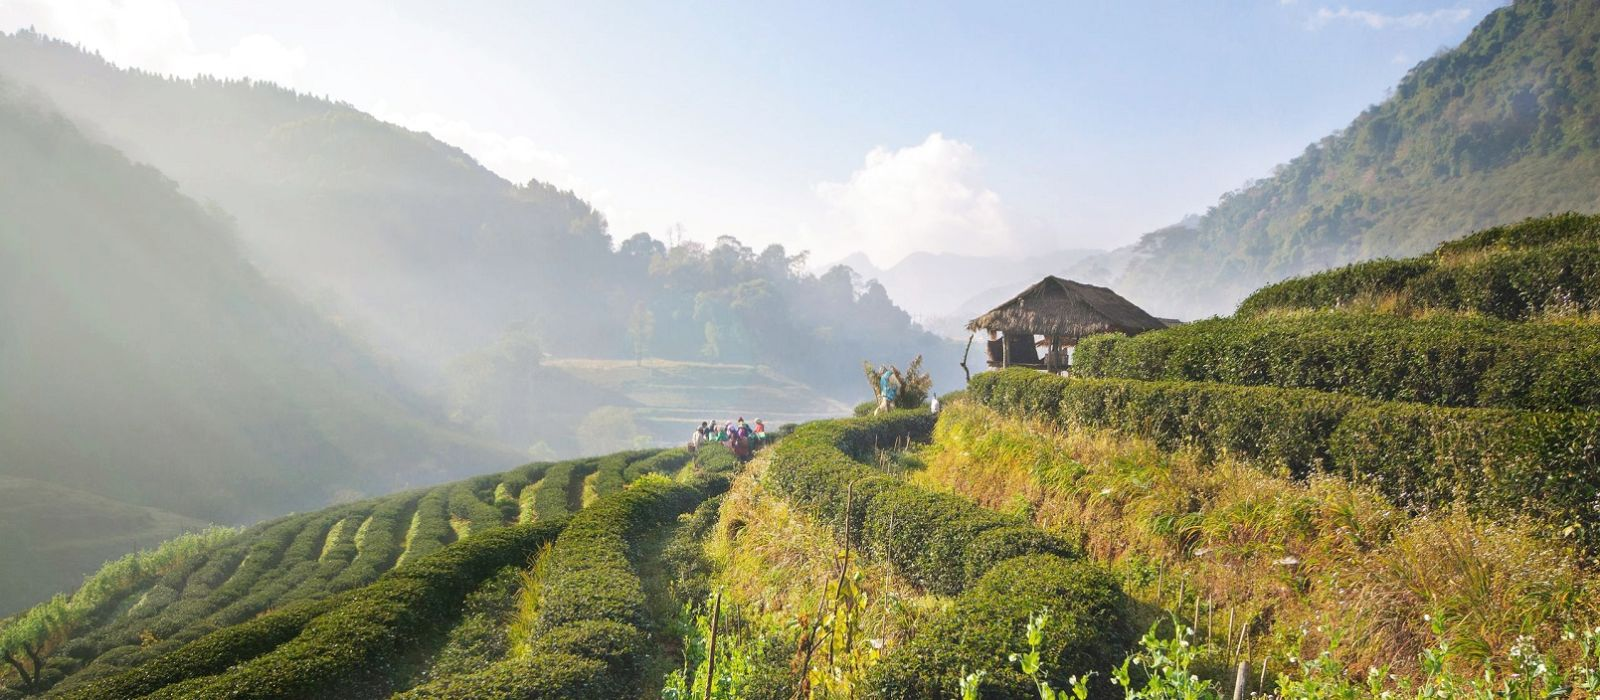 Thailand's Northern Heart and Koh Samui Beach Tour Trip 4